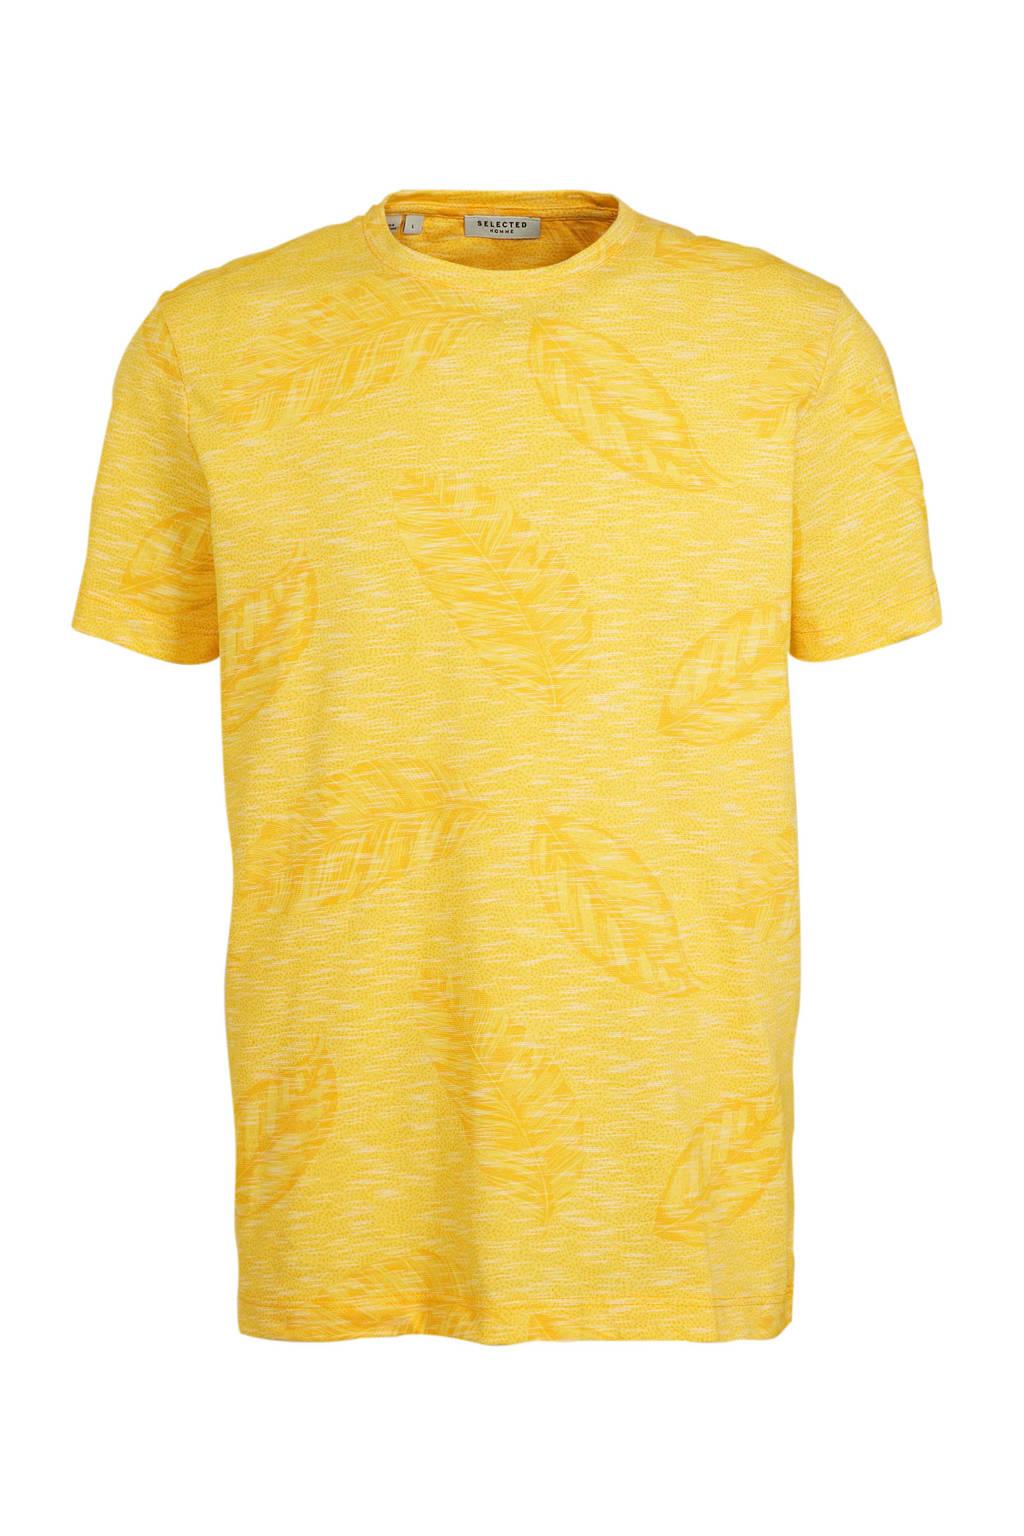 SELECTED HOMME T-shirt met all over print geel, Geel